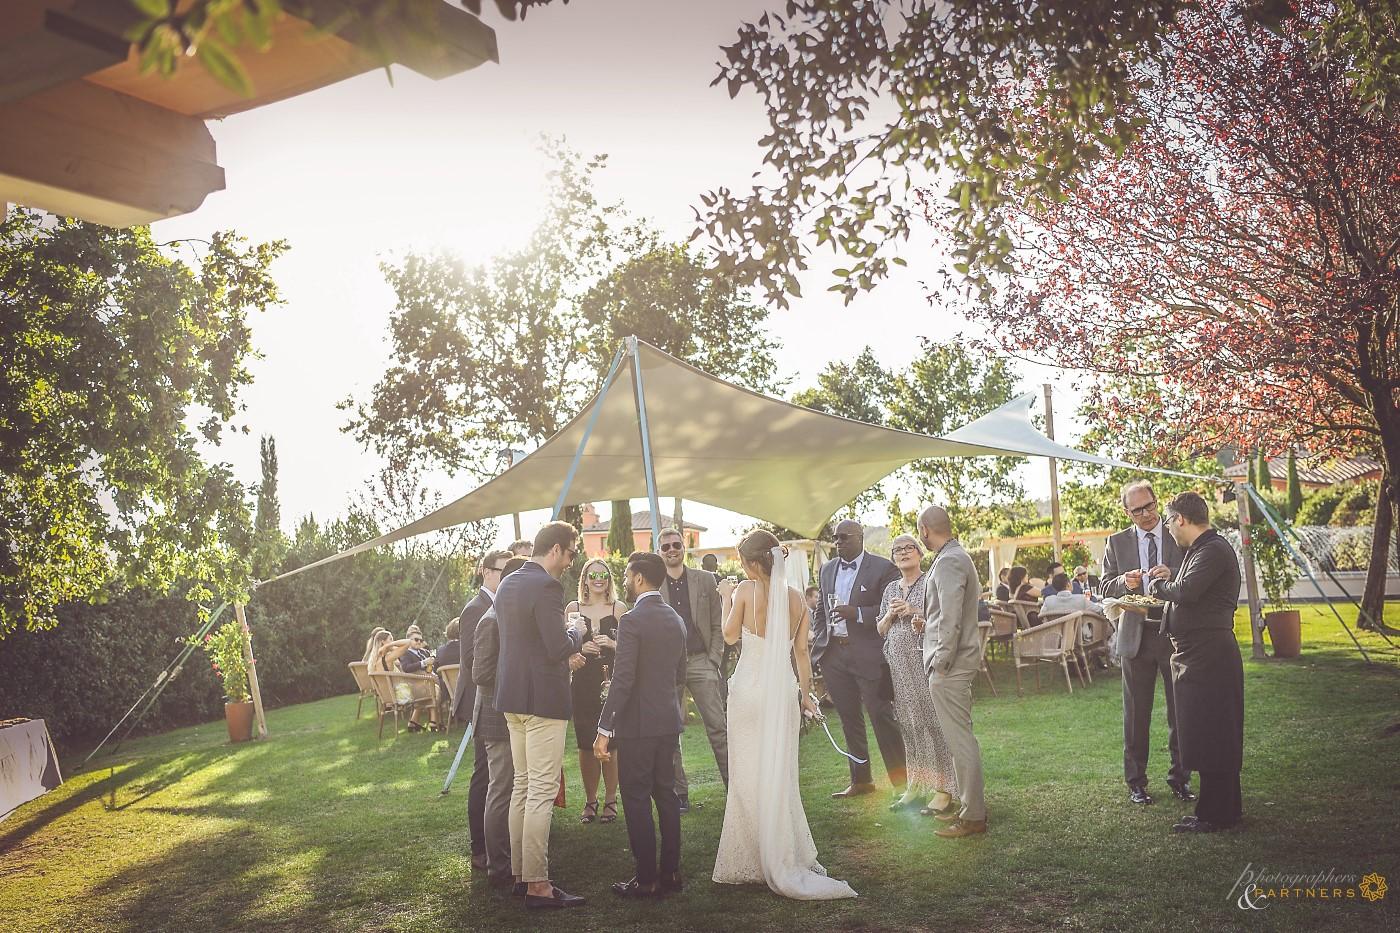 wedding_photos_tenuta_quadrifoglio_18.jpg